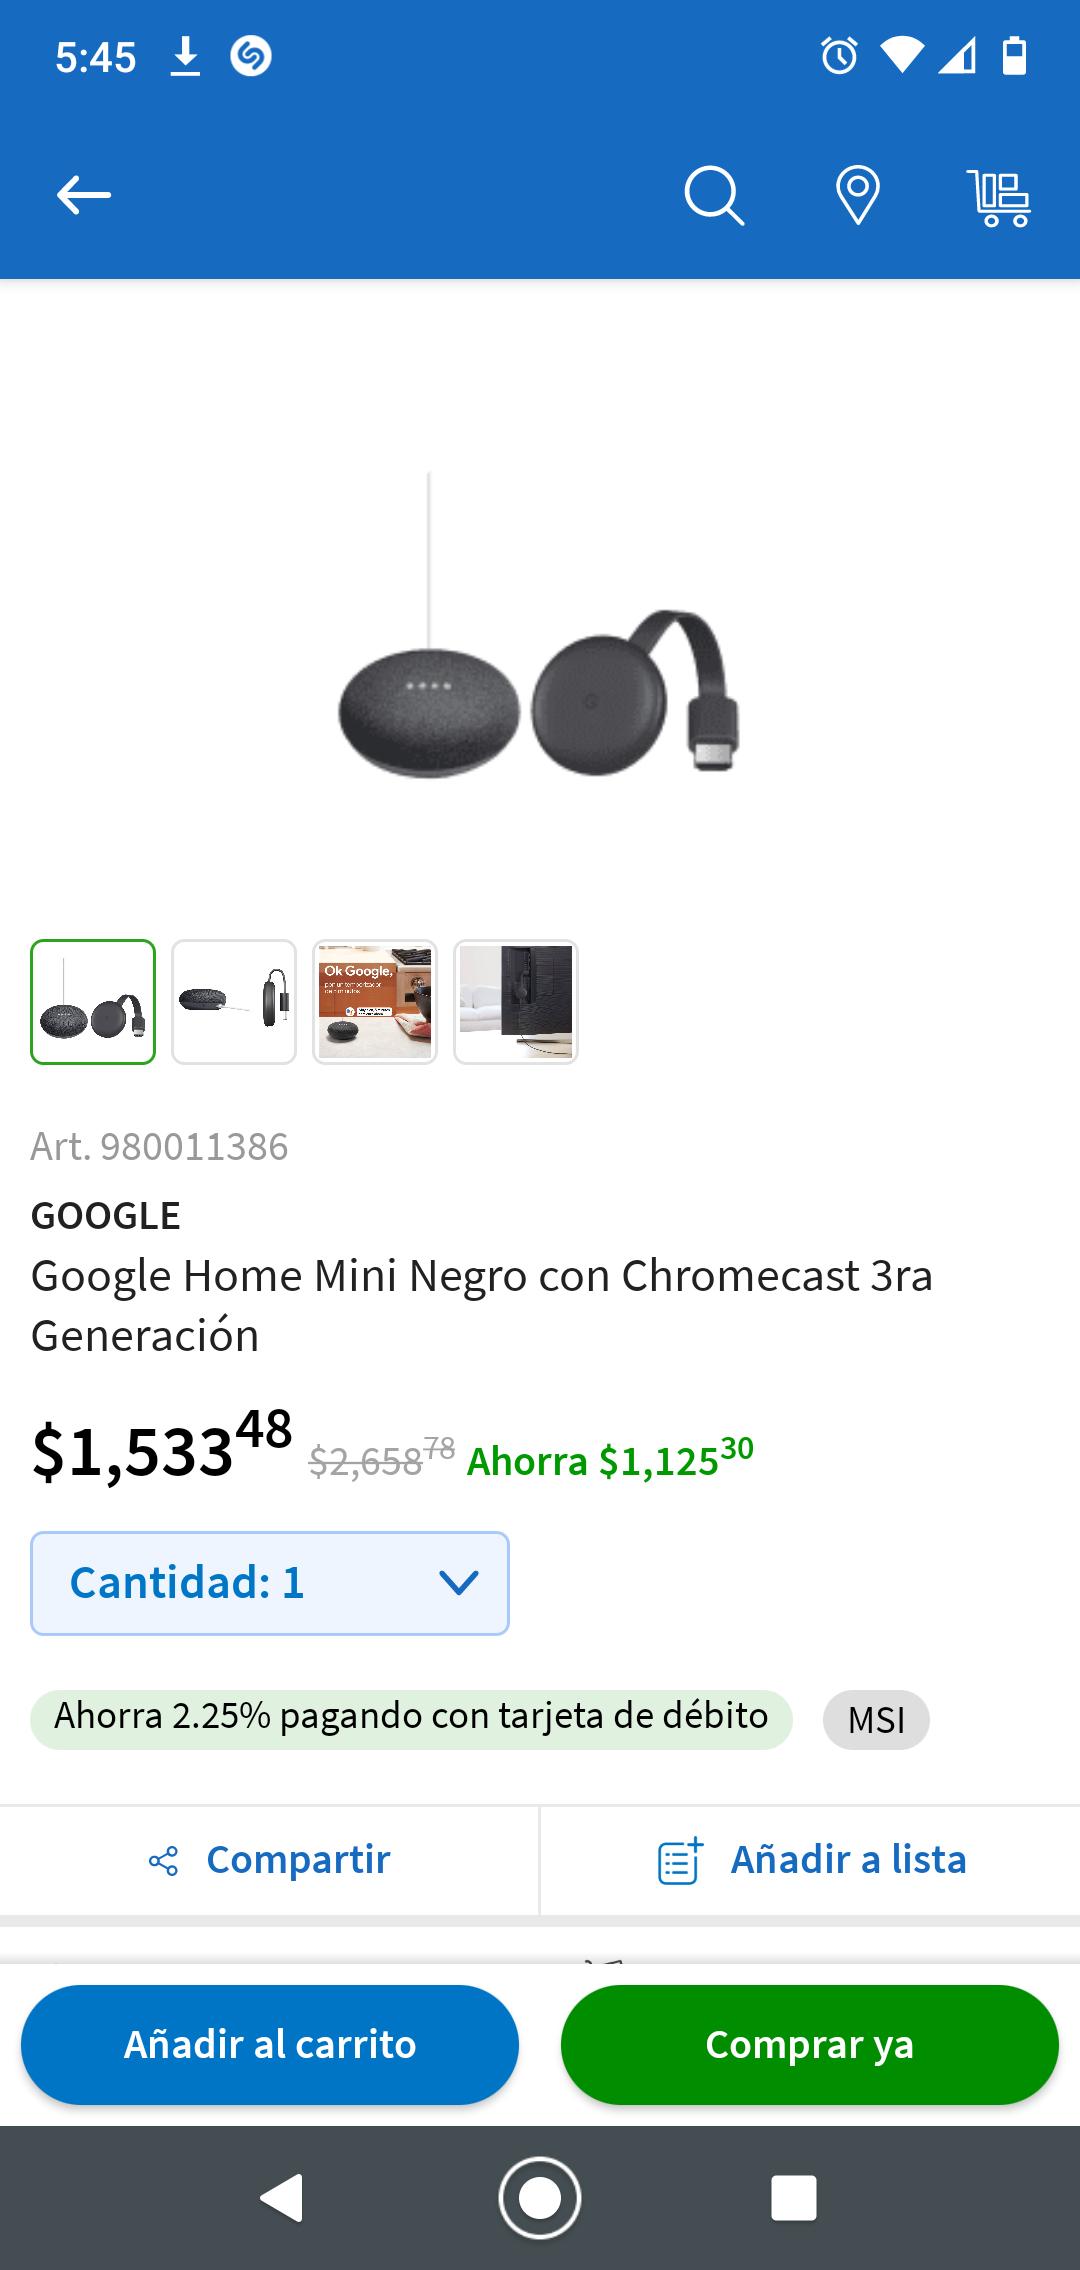 Sam's club: Google Home Mini Negro con Chromecast 3ra Generación